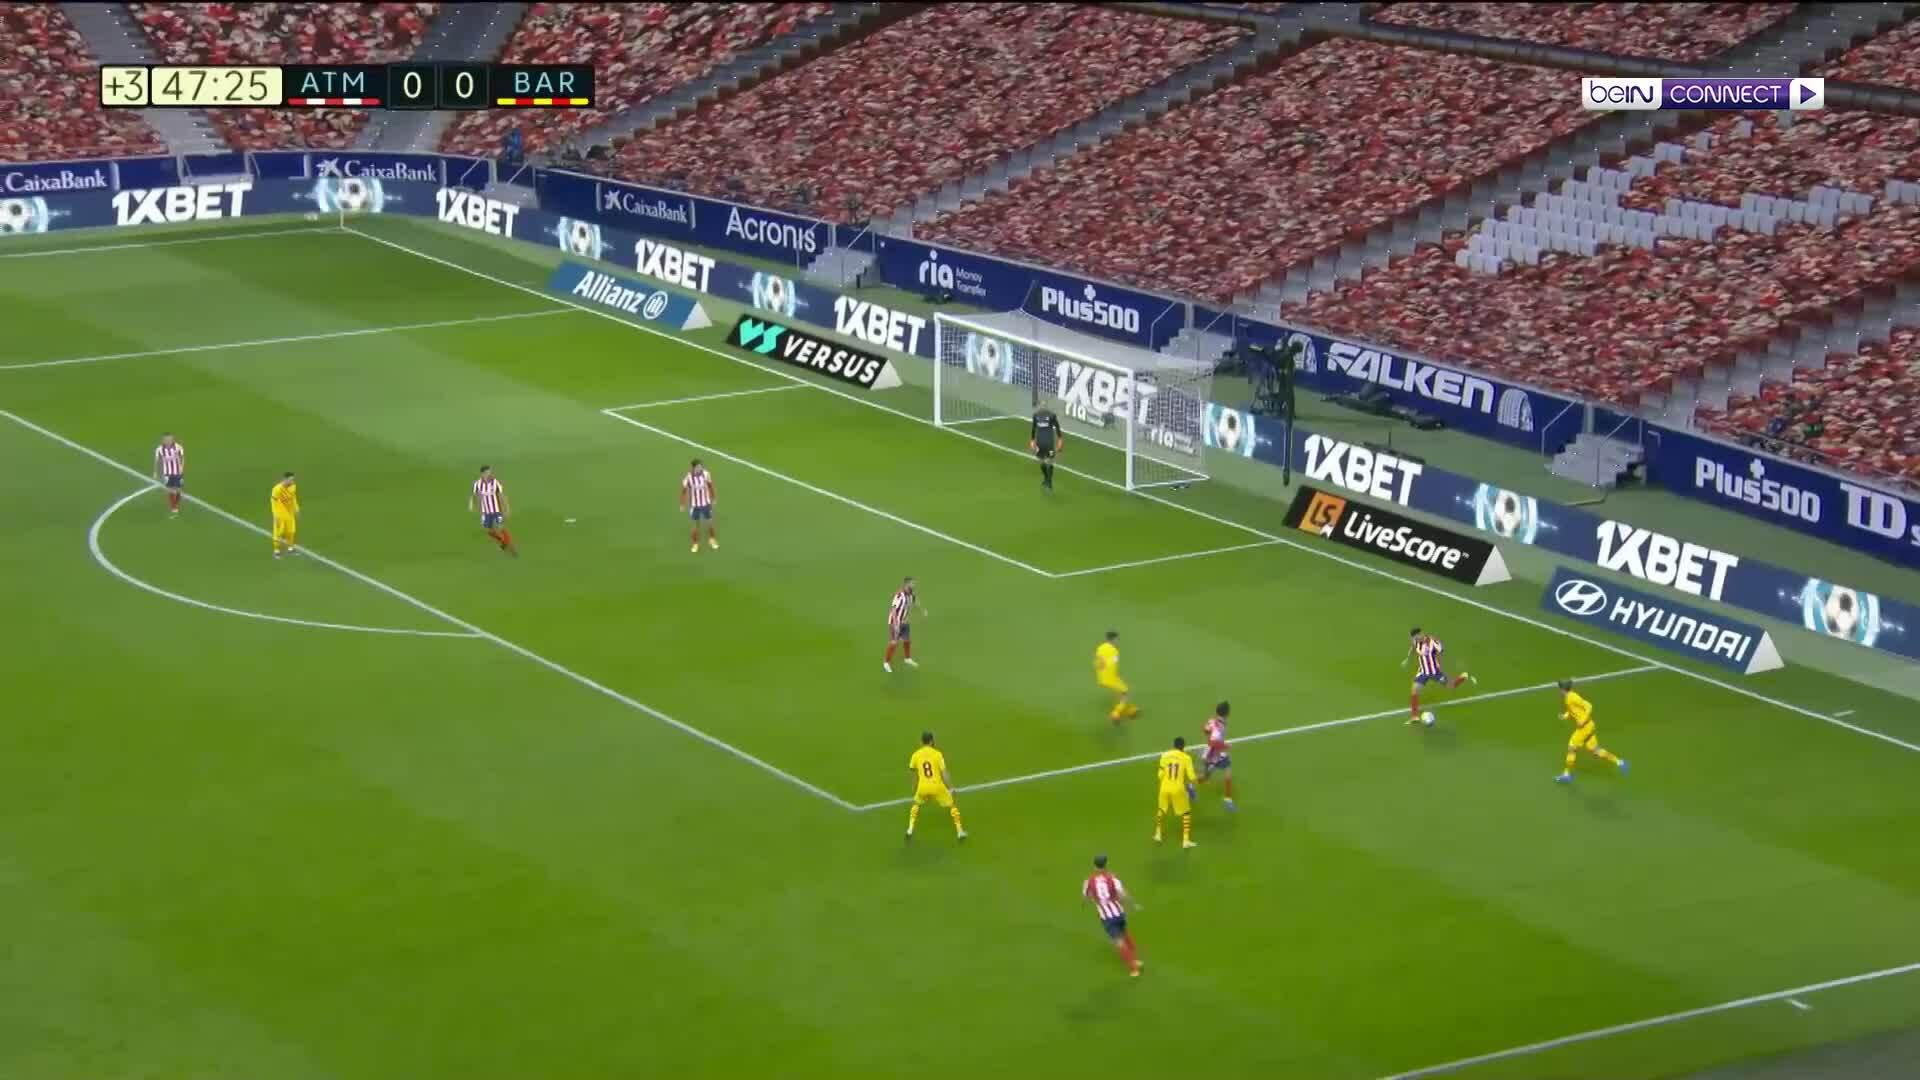 Atletico Madrid 1-0 Barca